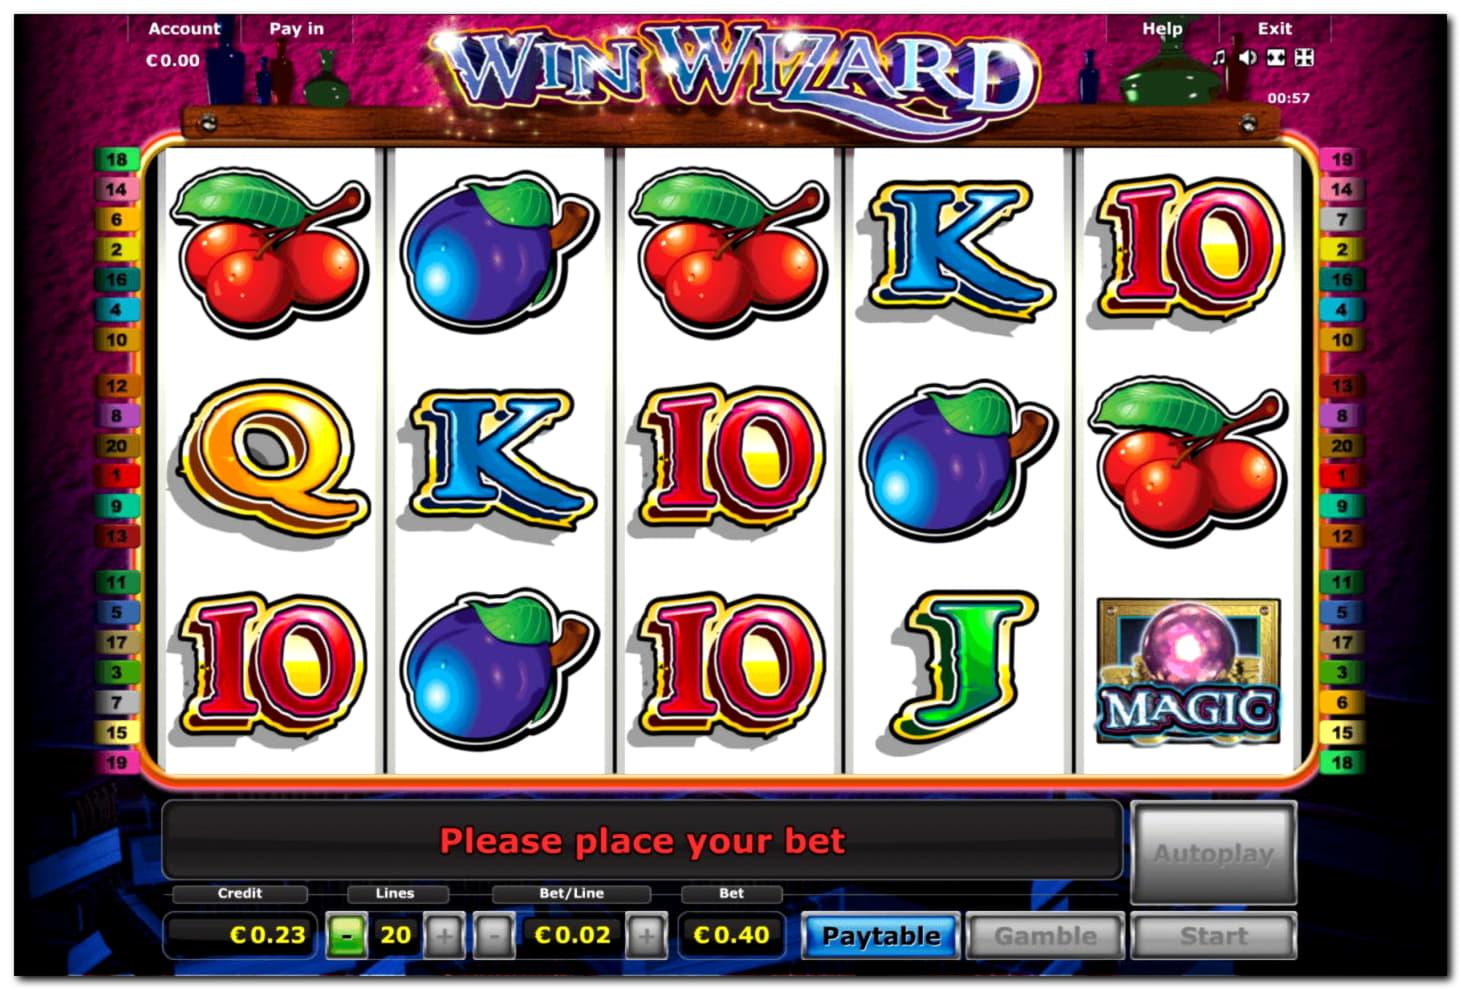 33 Free spins no deposit casino at 888 Casino